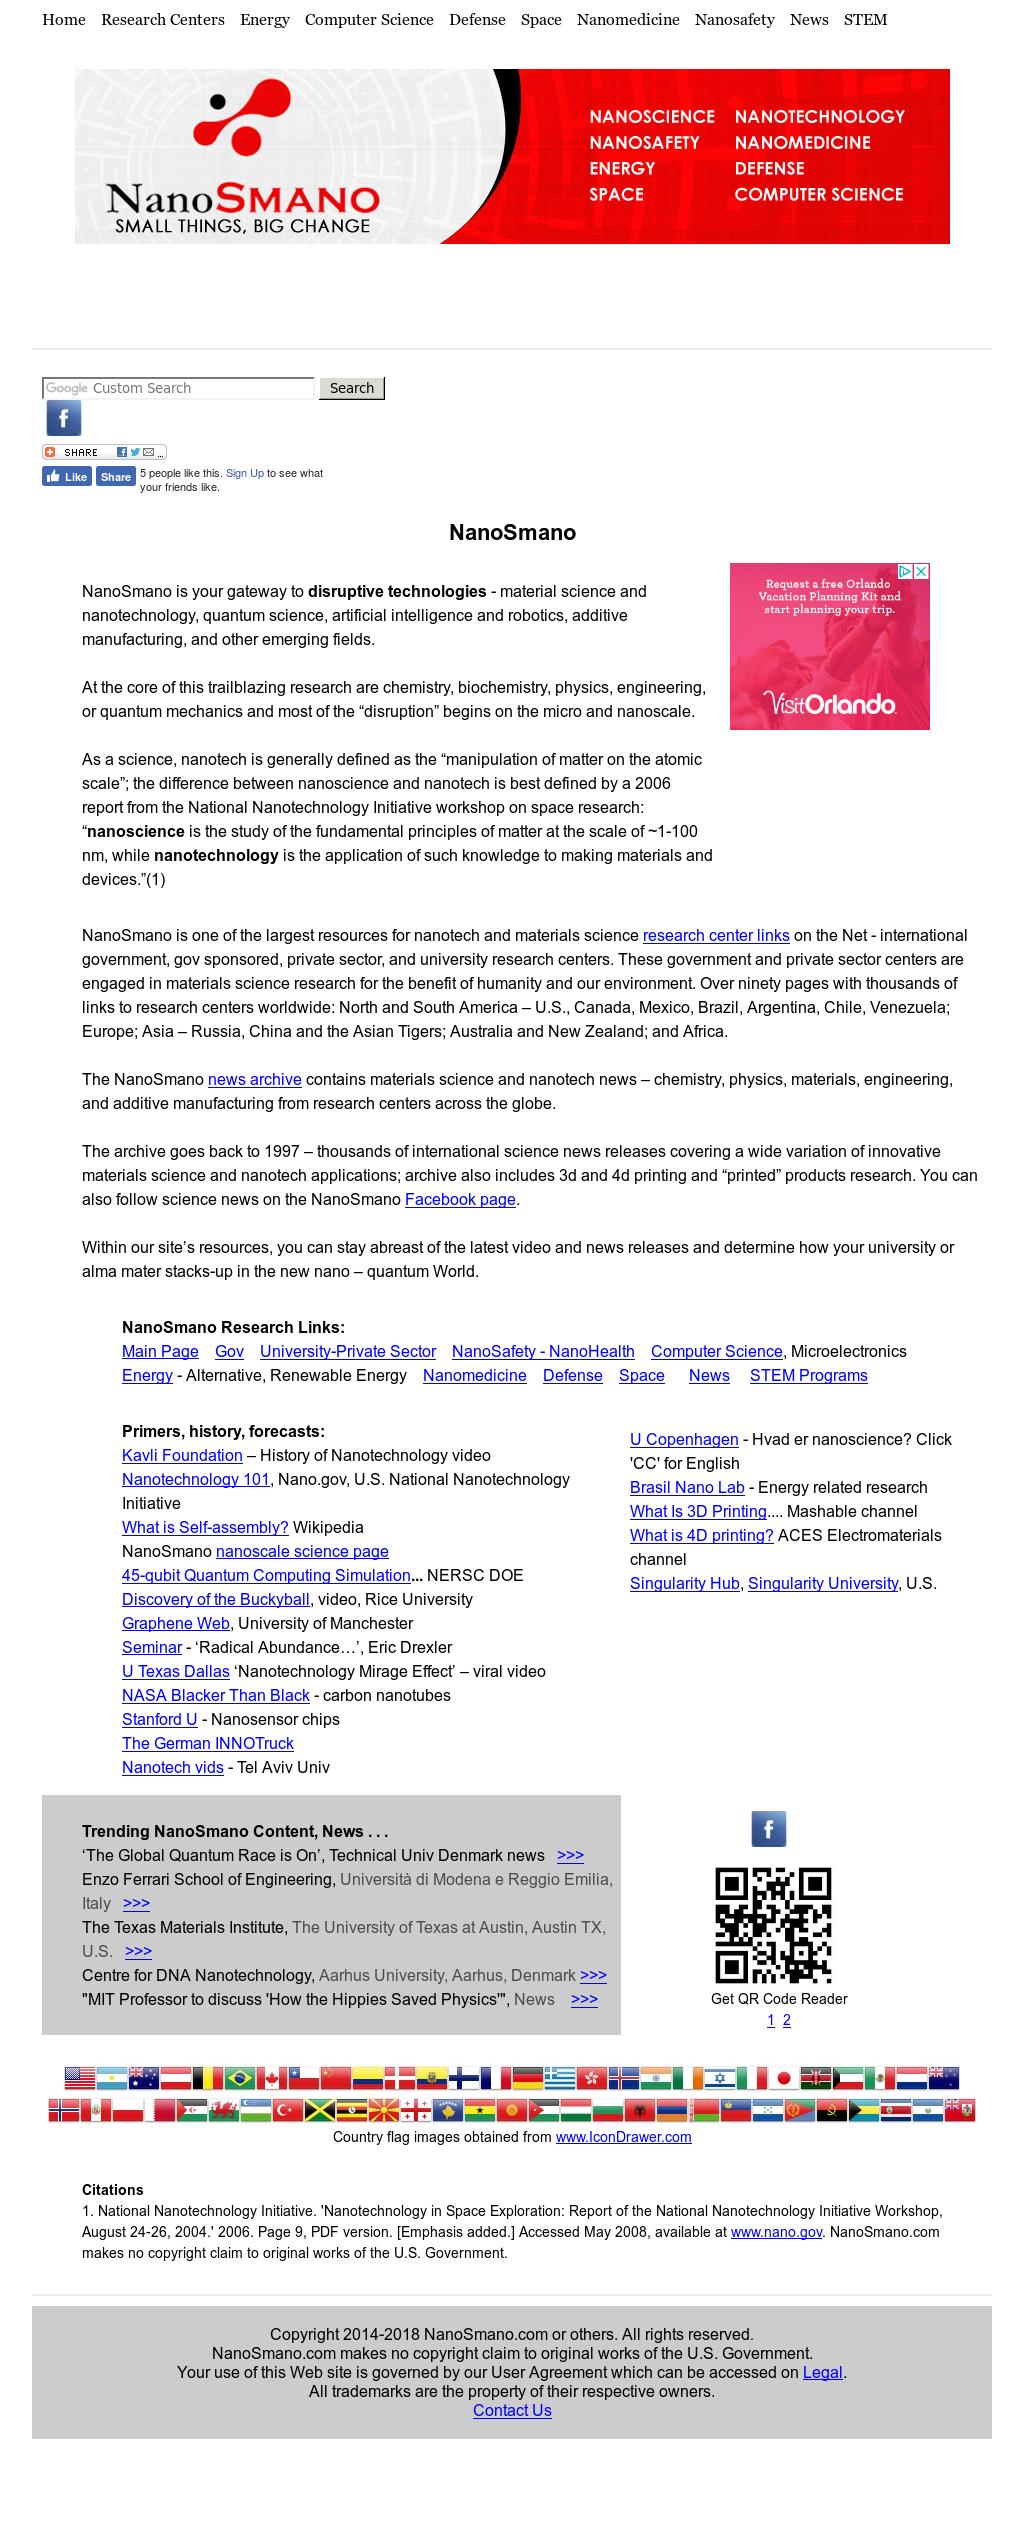 Nanosmano Competitors, Revenue and Employees - Owler Company